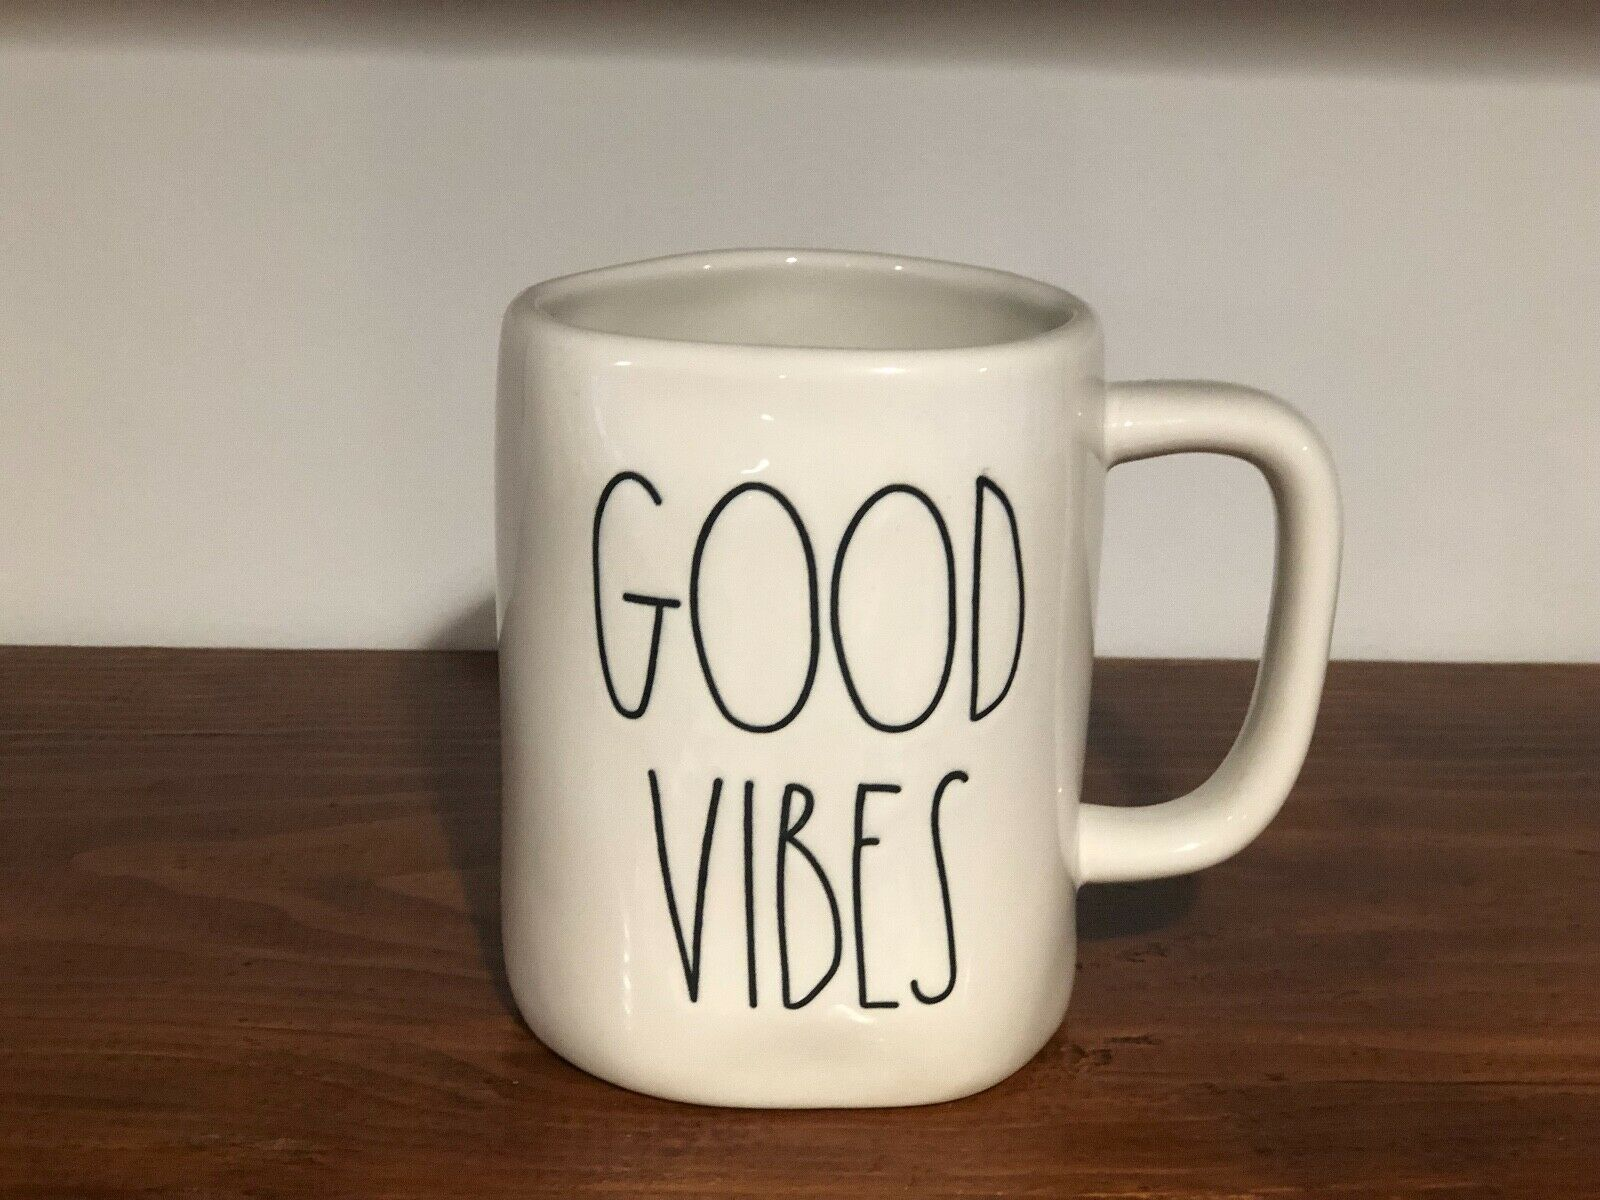 Rae Dunn Artisan Collection By Magenta Farmhouse LL Large Letter Coffee Tea Mug GOOD VIBES